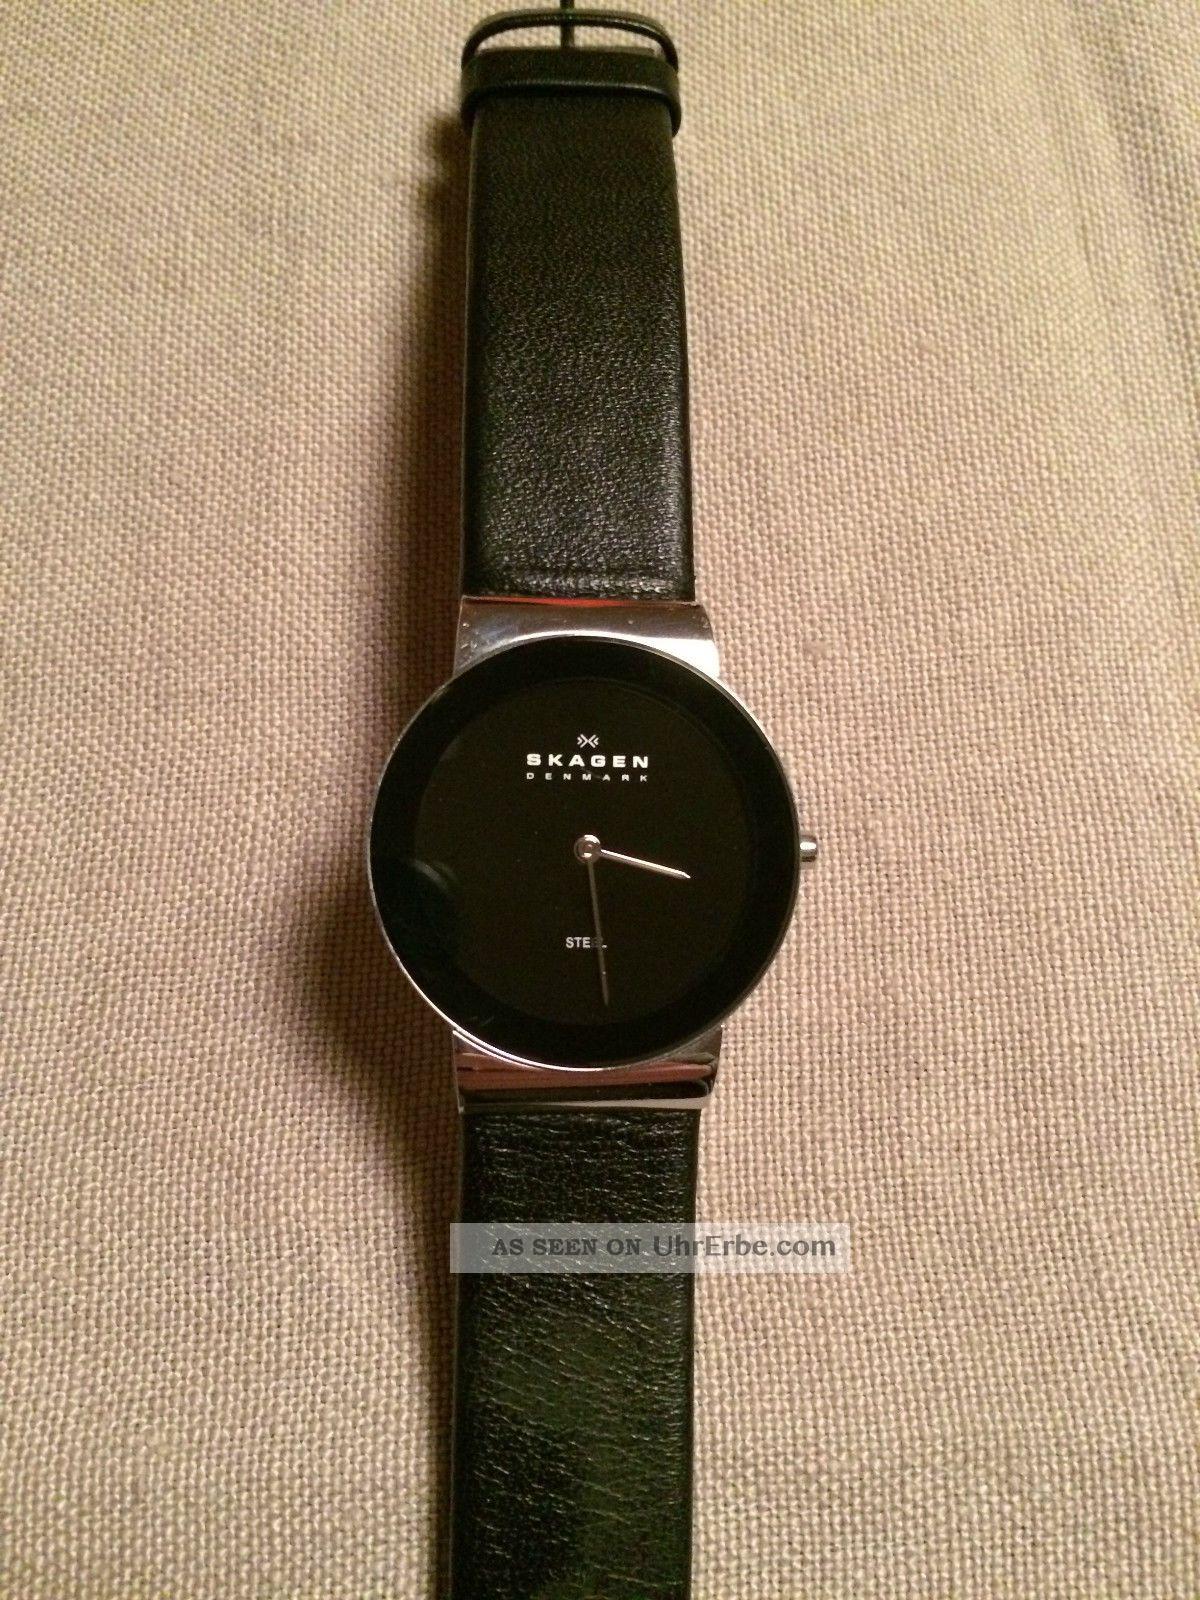 Skagen Slimline Damen Arbanduhr (358lslb) Armbanduhren Bild